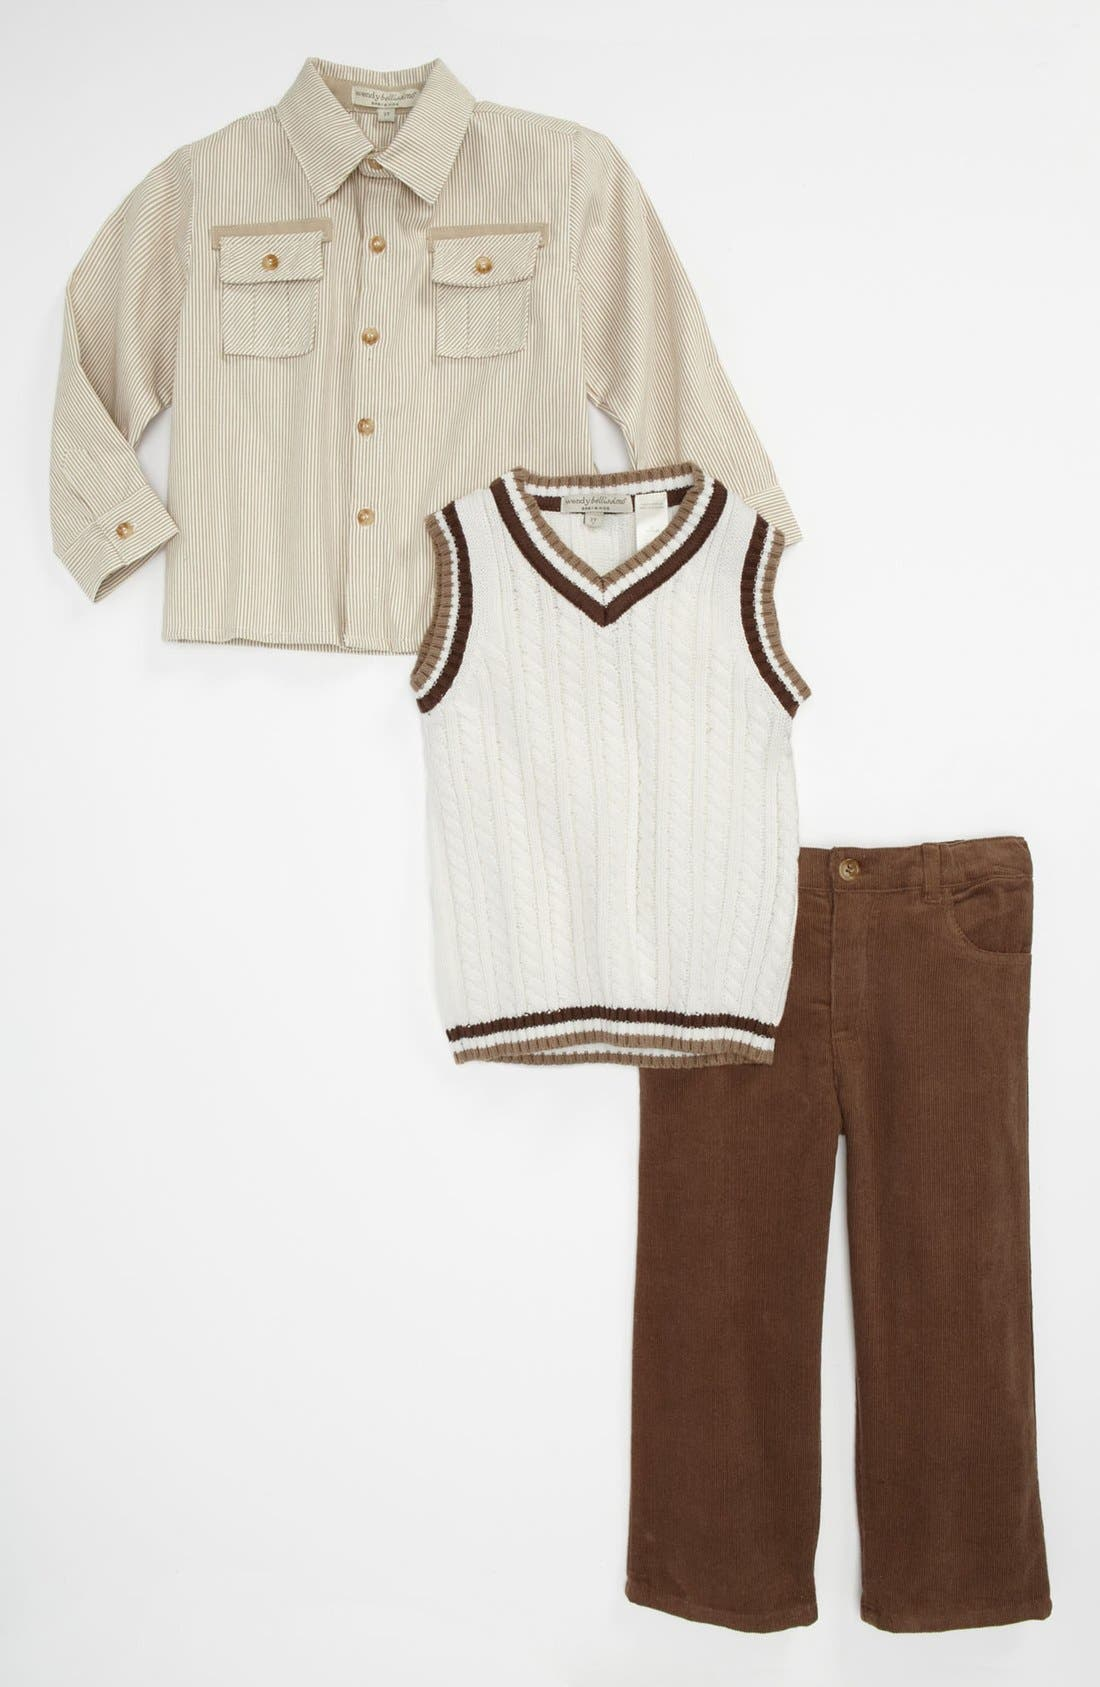 Main Image - Wendy Bellisimo Sweater, Shirt and Pants Set (Baby)